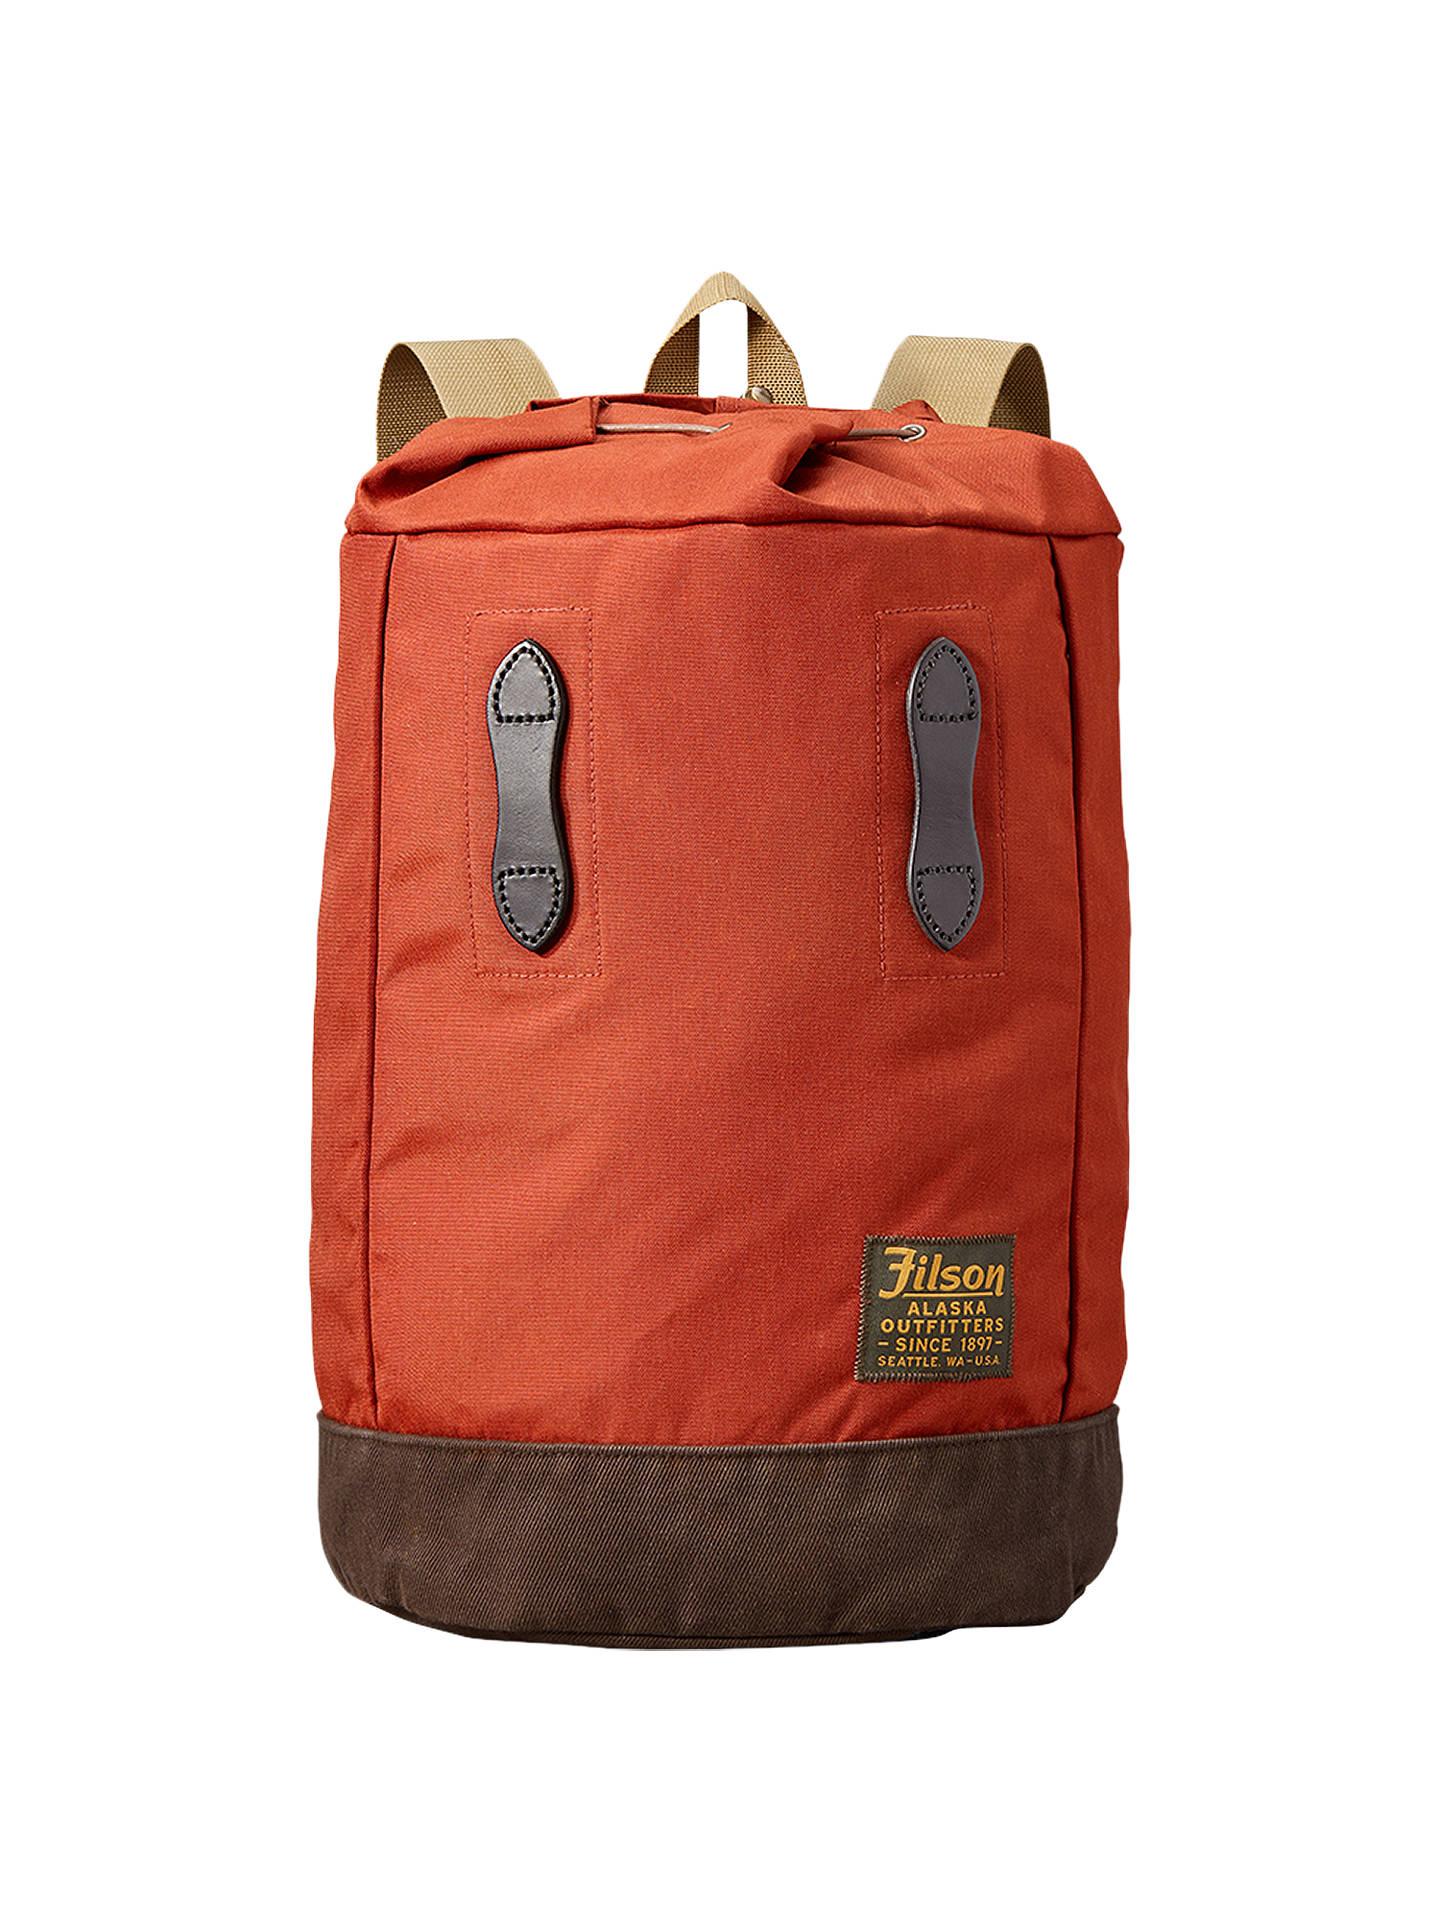 cc06d61e988c Filson Ballistic Nylon Day Backpack at John Lewis   Partners